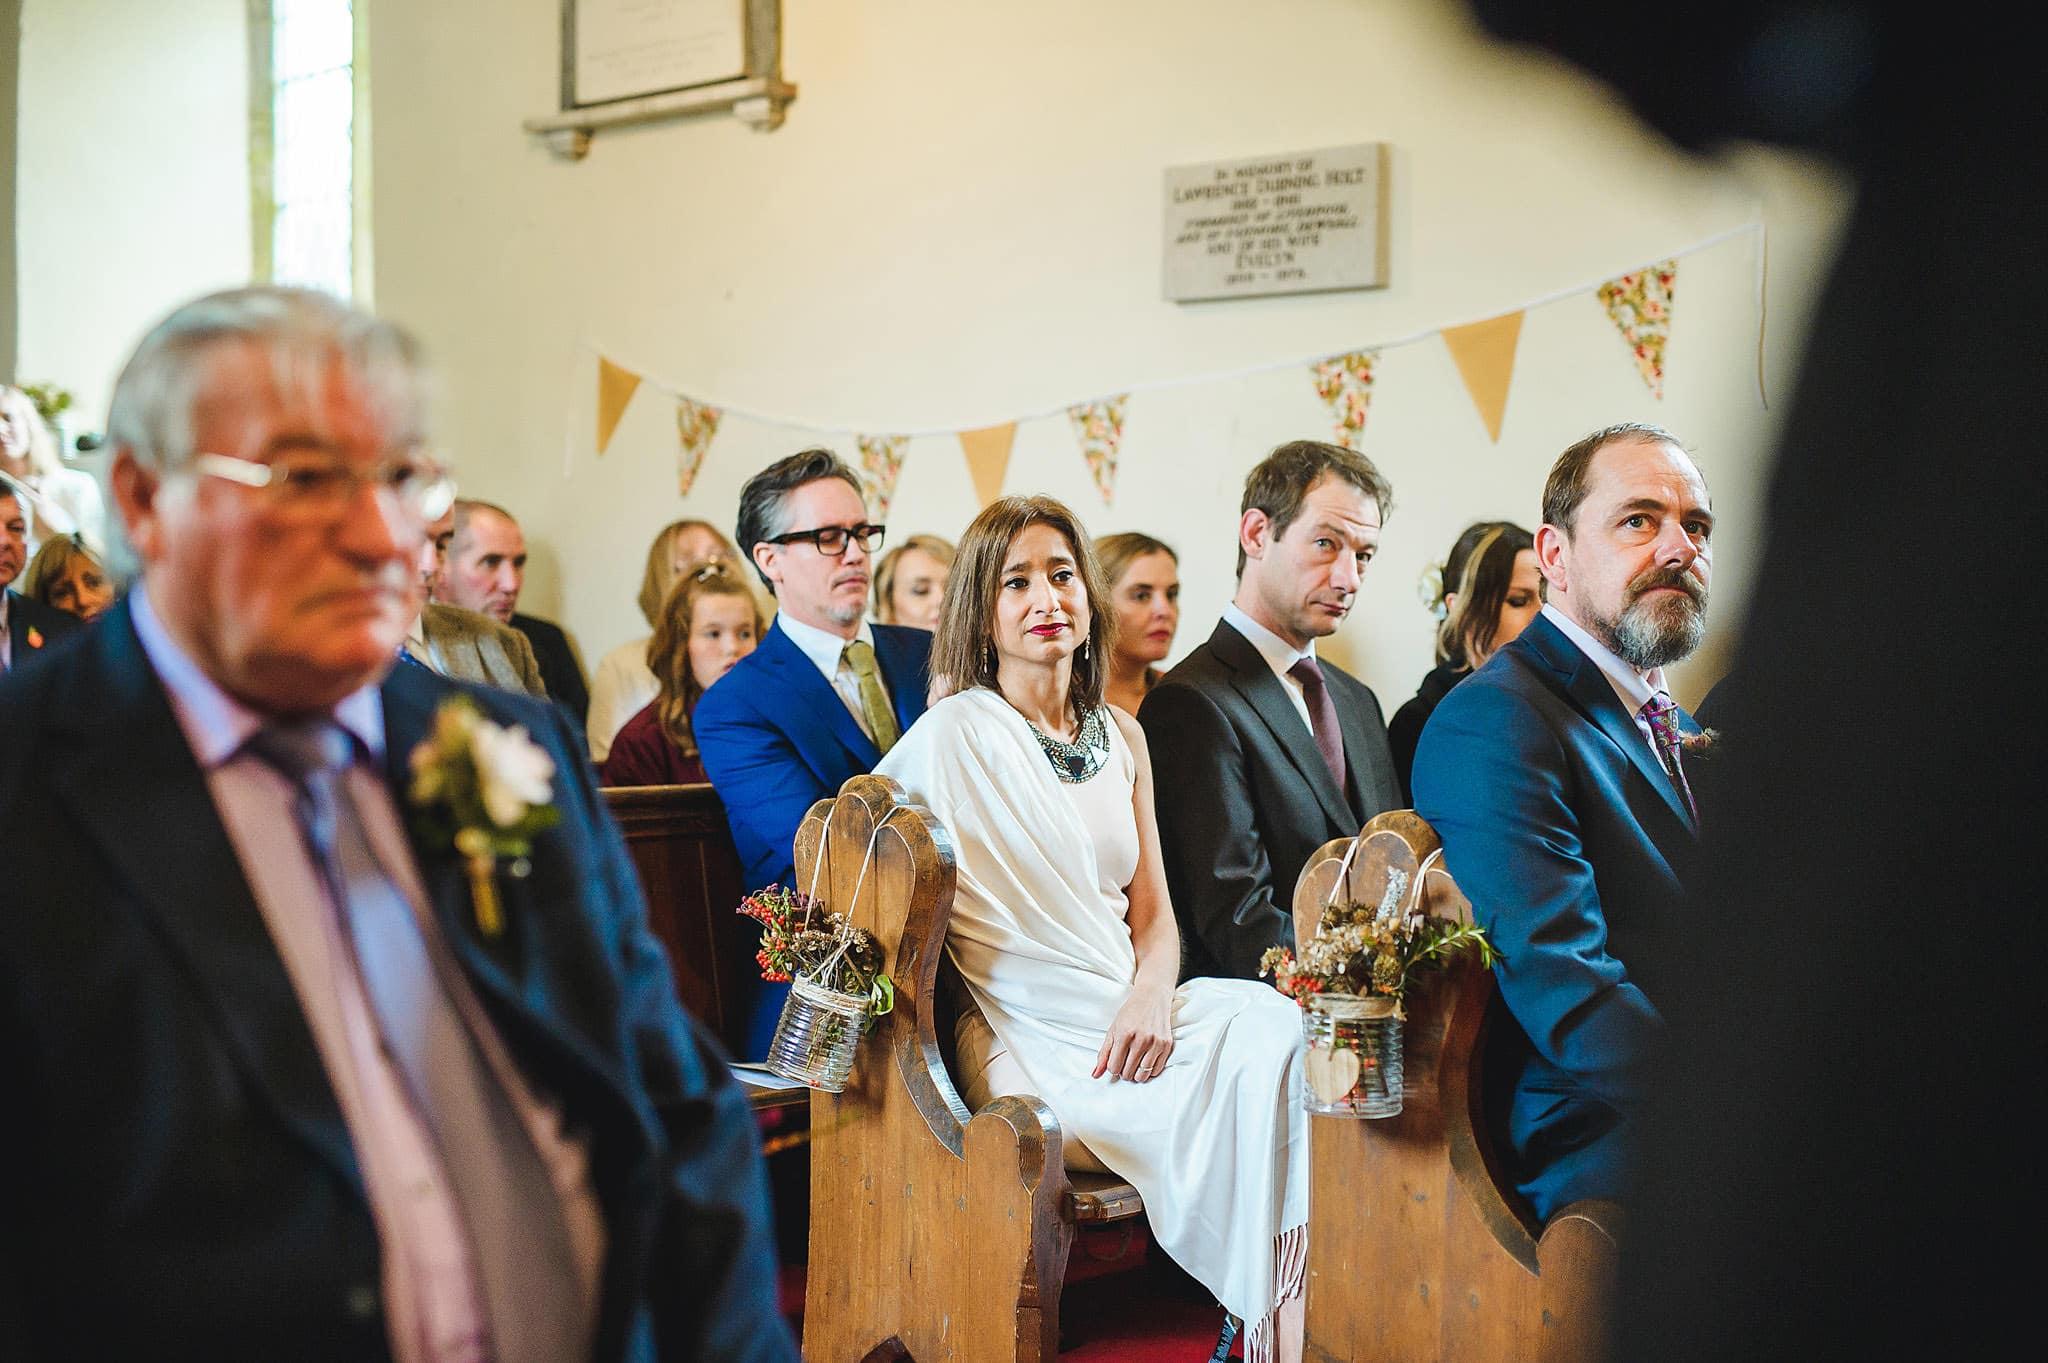 Dewsall Court wedding photography Herefordshire | Laura + Alex 52